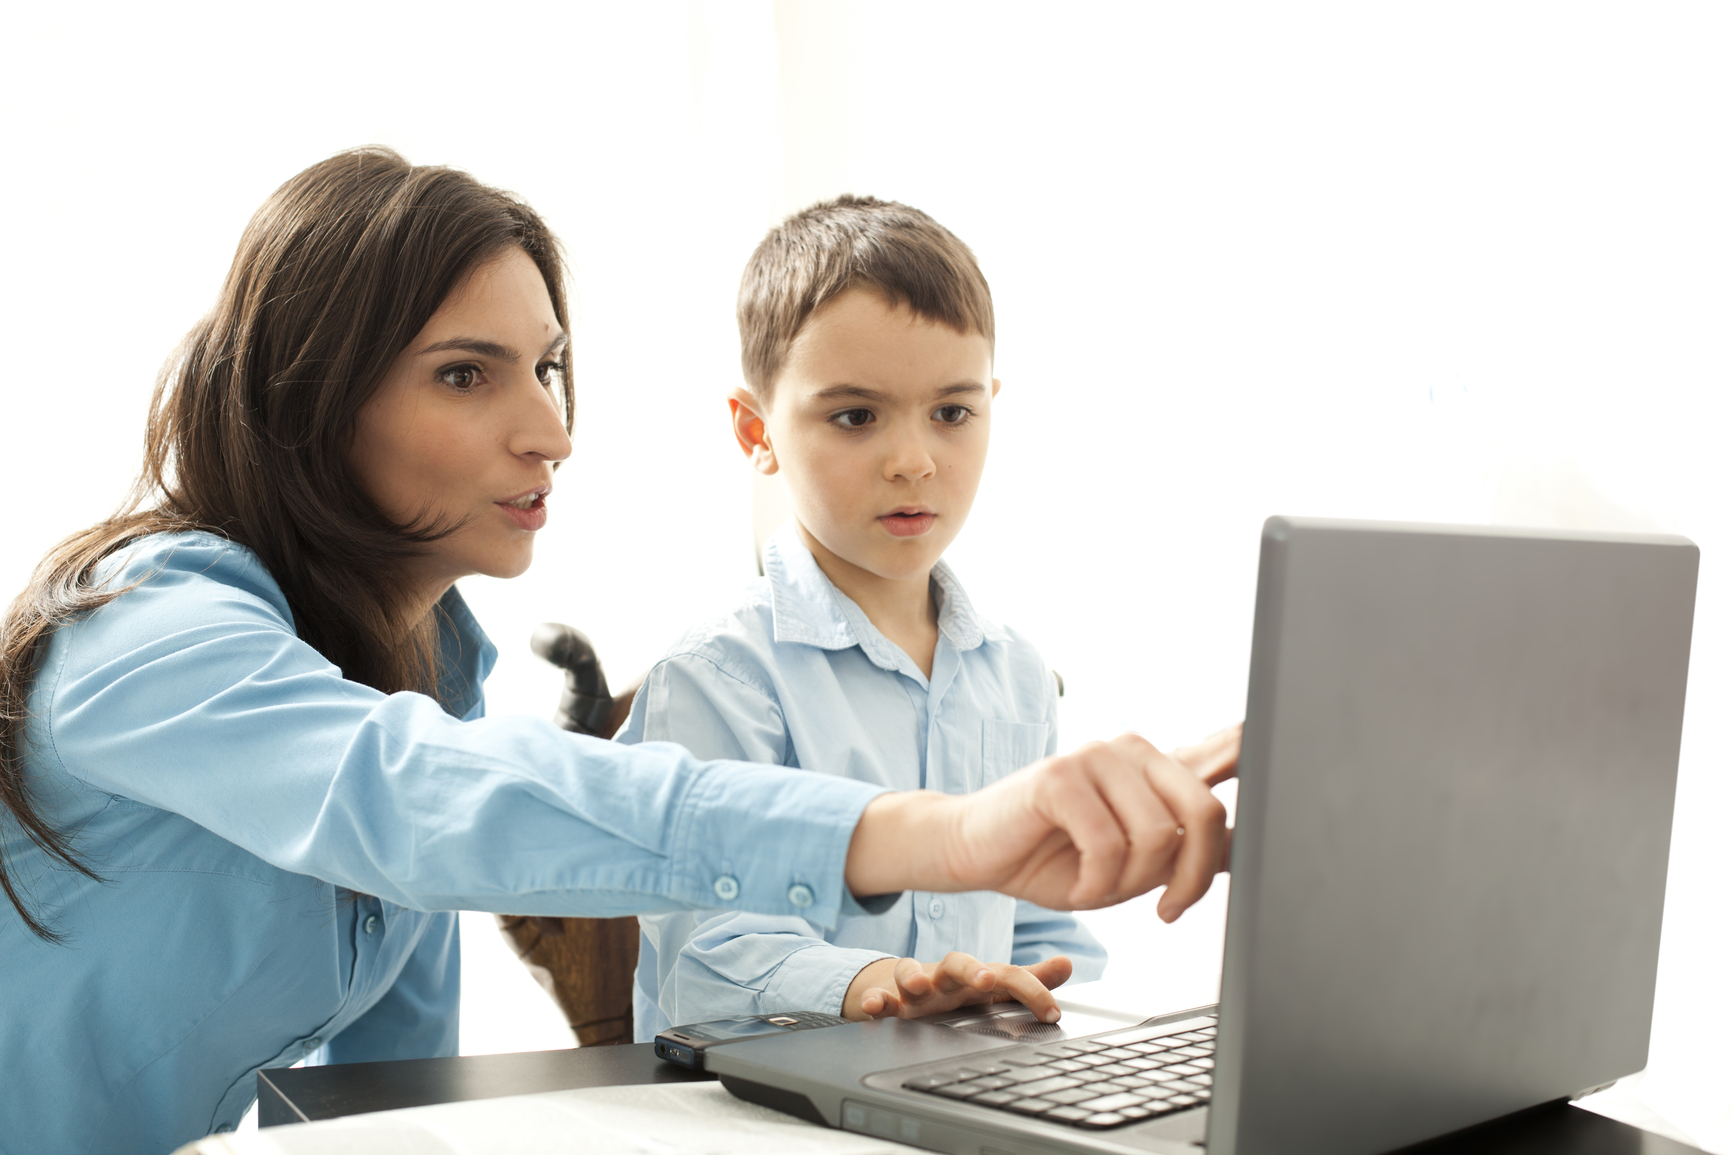 Parents monitoring social media